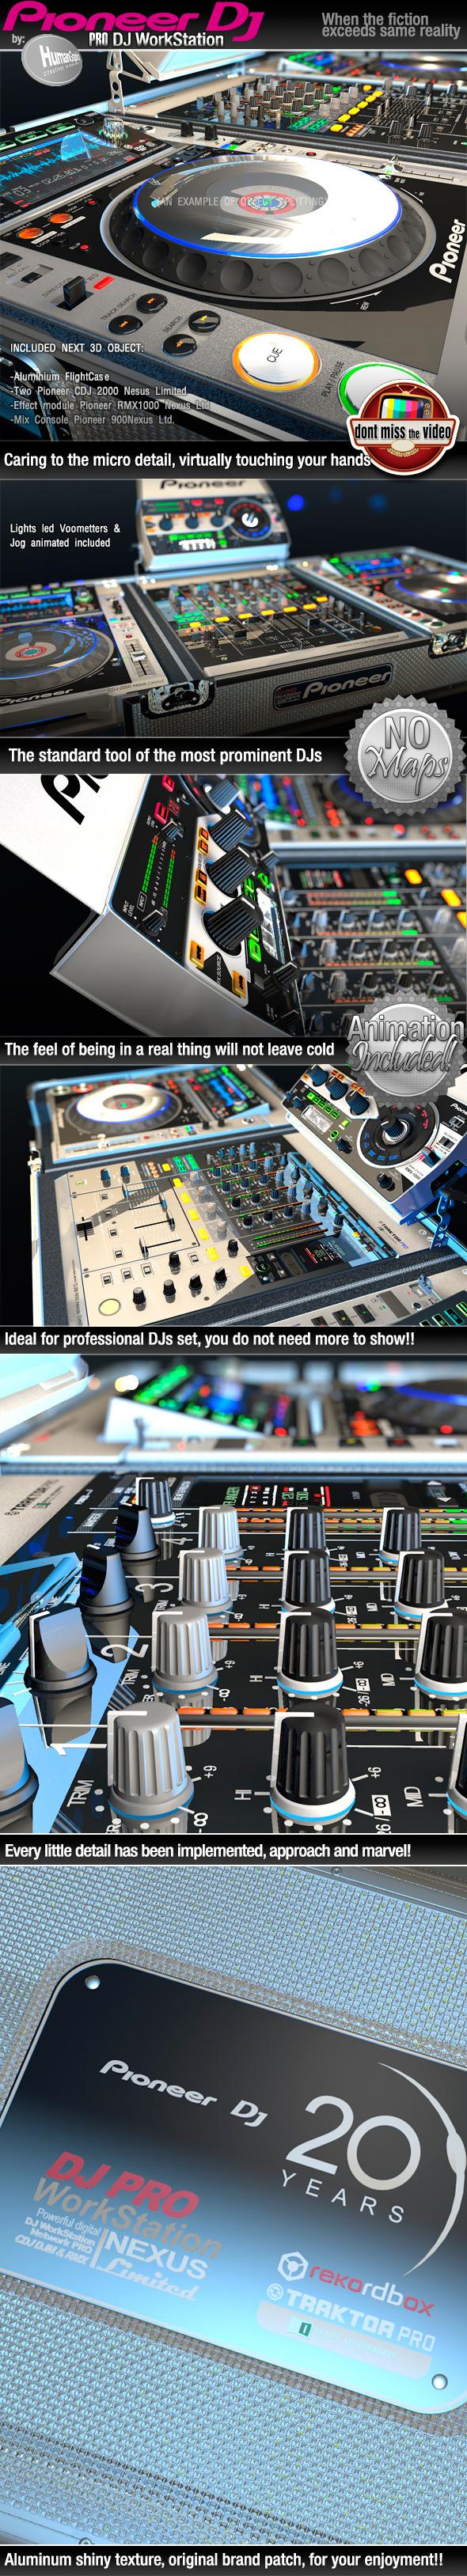 Pro DJ Equipment Workstation Flightcase Digital CDJ & RMX Pioneer - 3DOcean Item for Sale